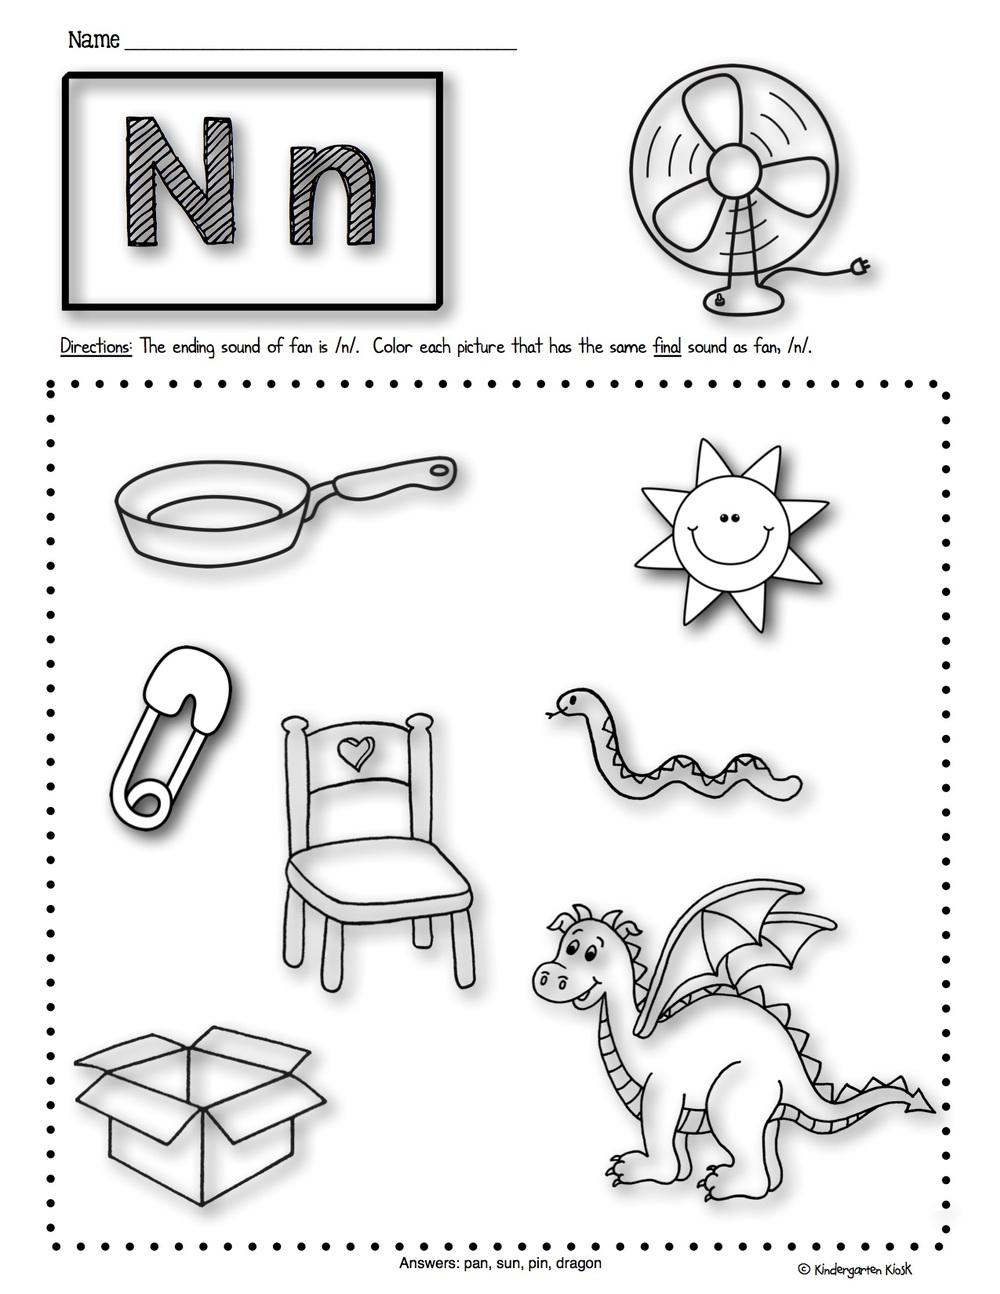 math worksheet : phonics prep ending sounds worksheets  kindergarten kiosk : Ending Sounds Worksheets Kindergarten